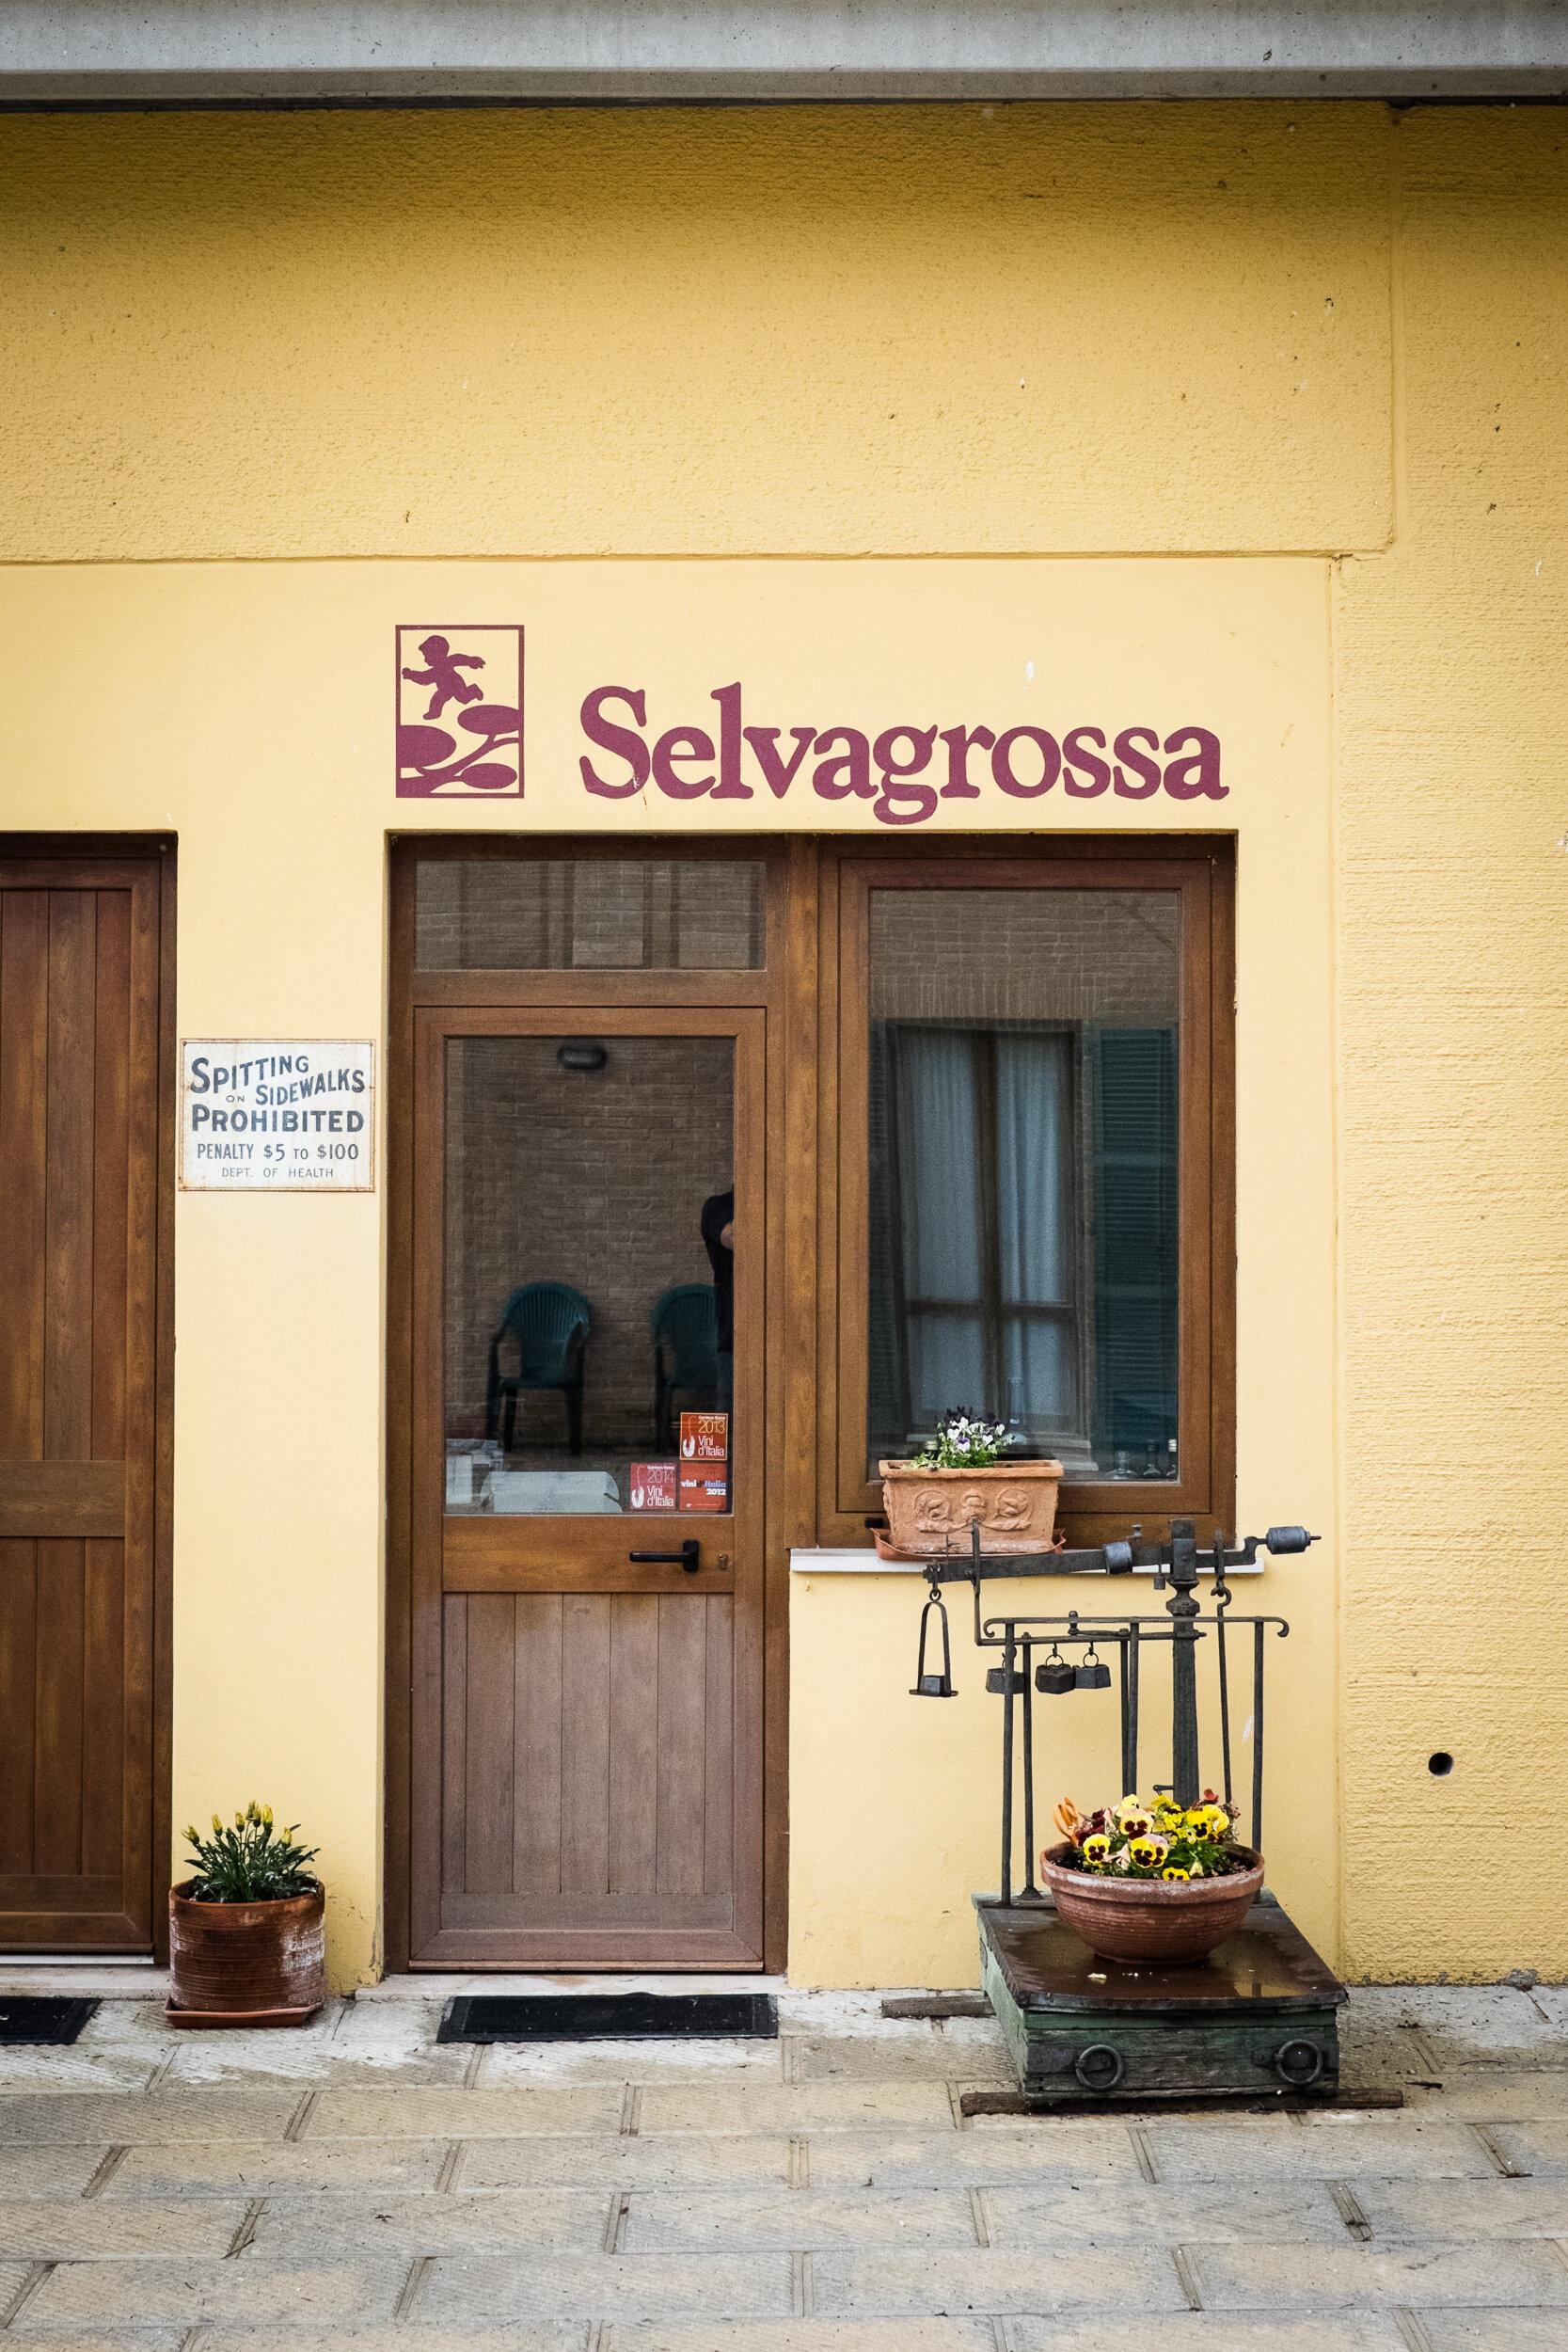 2-Selvagrossa GALDONES PHOTOGRAPHY-3810.jpg